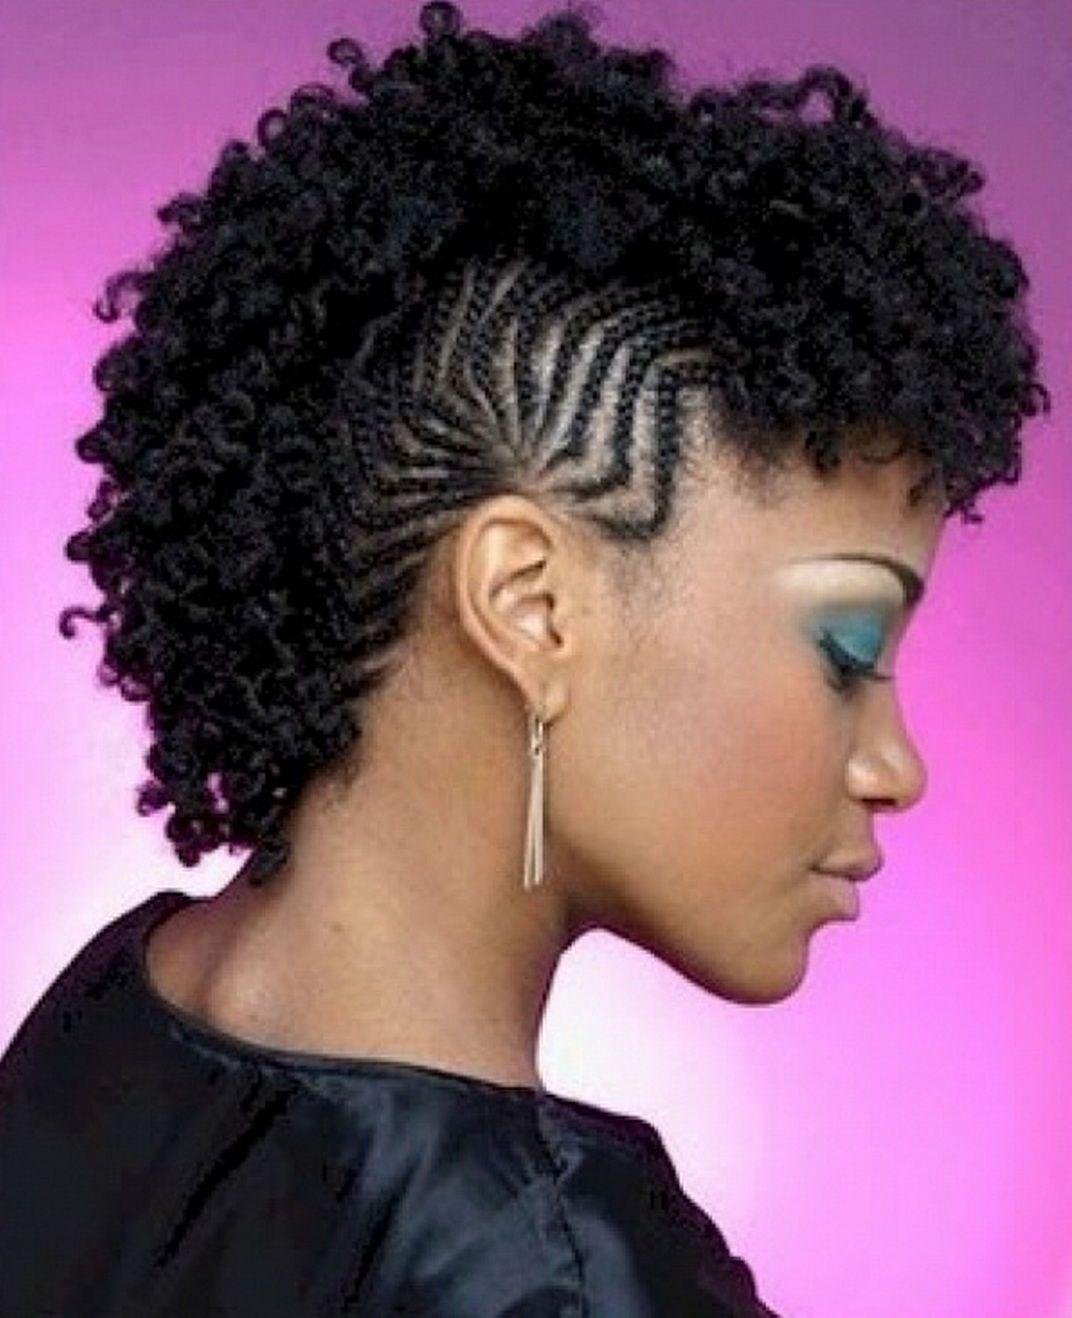 Black Female Mohawk Hairstyles Wallpaper Jpg 1072 1318 Hair Styles Natural Hair Styles Cool Braid Hairstyles